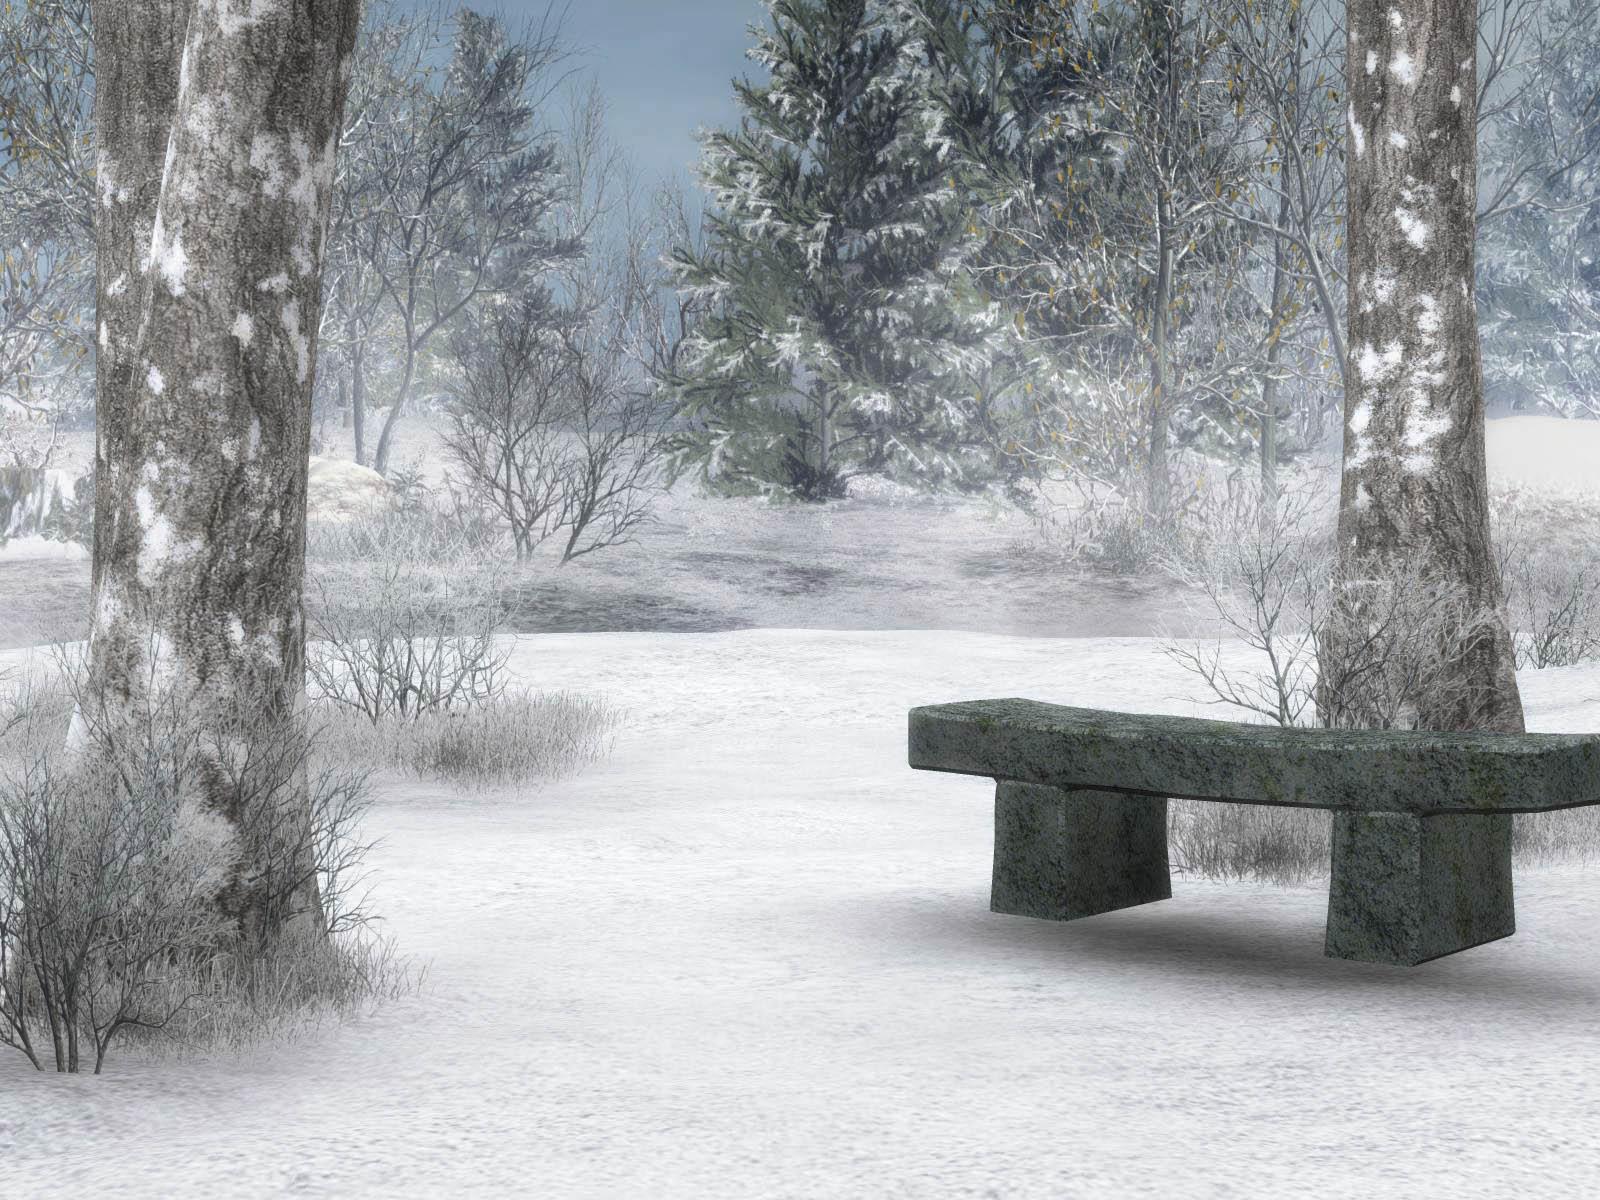 Winter Background Full HD wallpaperfree wallpaper High Definition 1600x1200